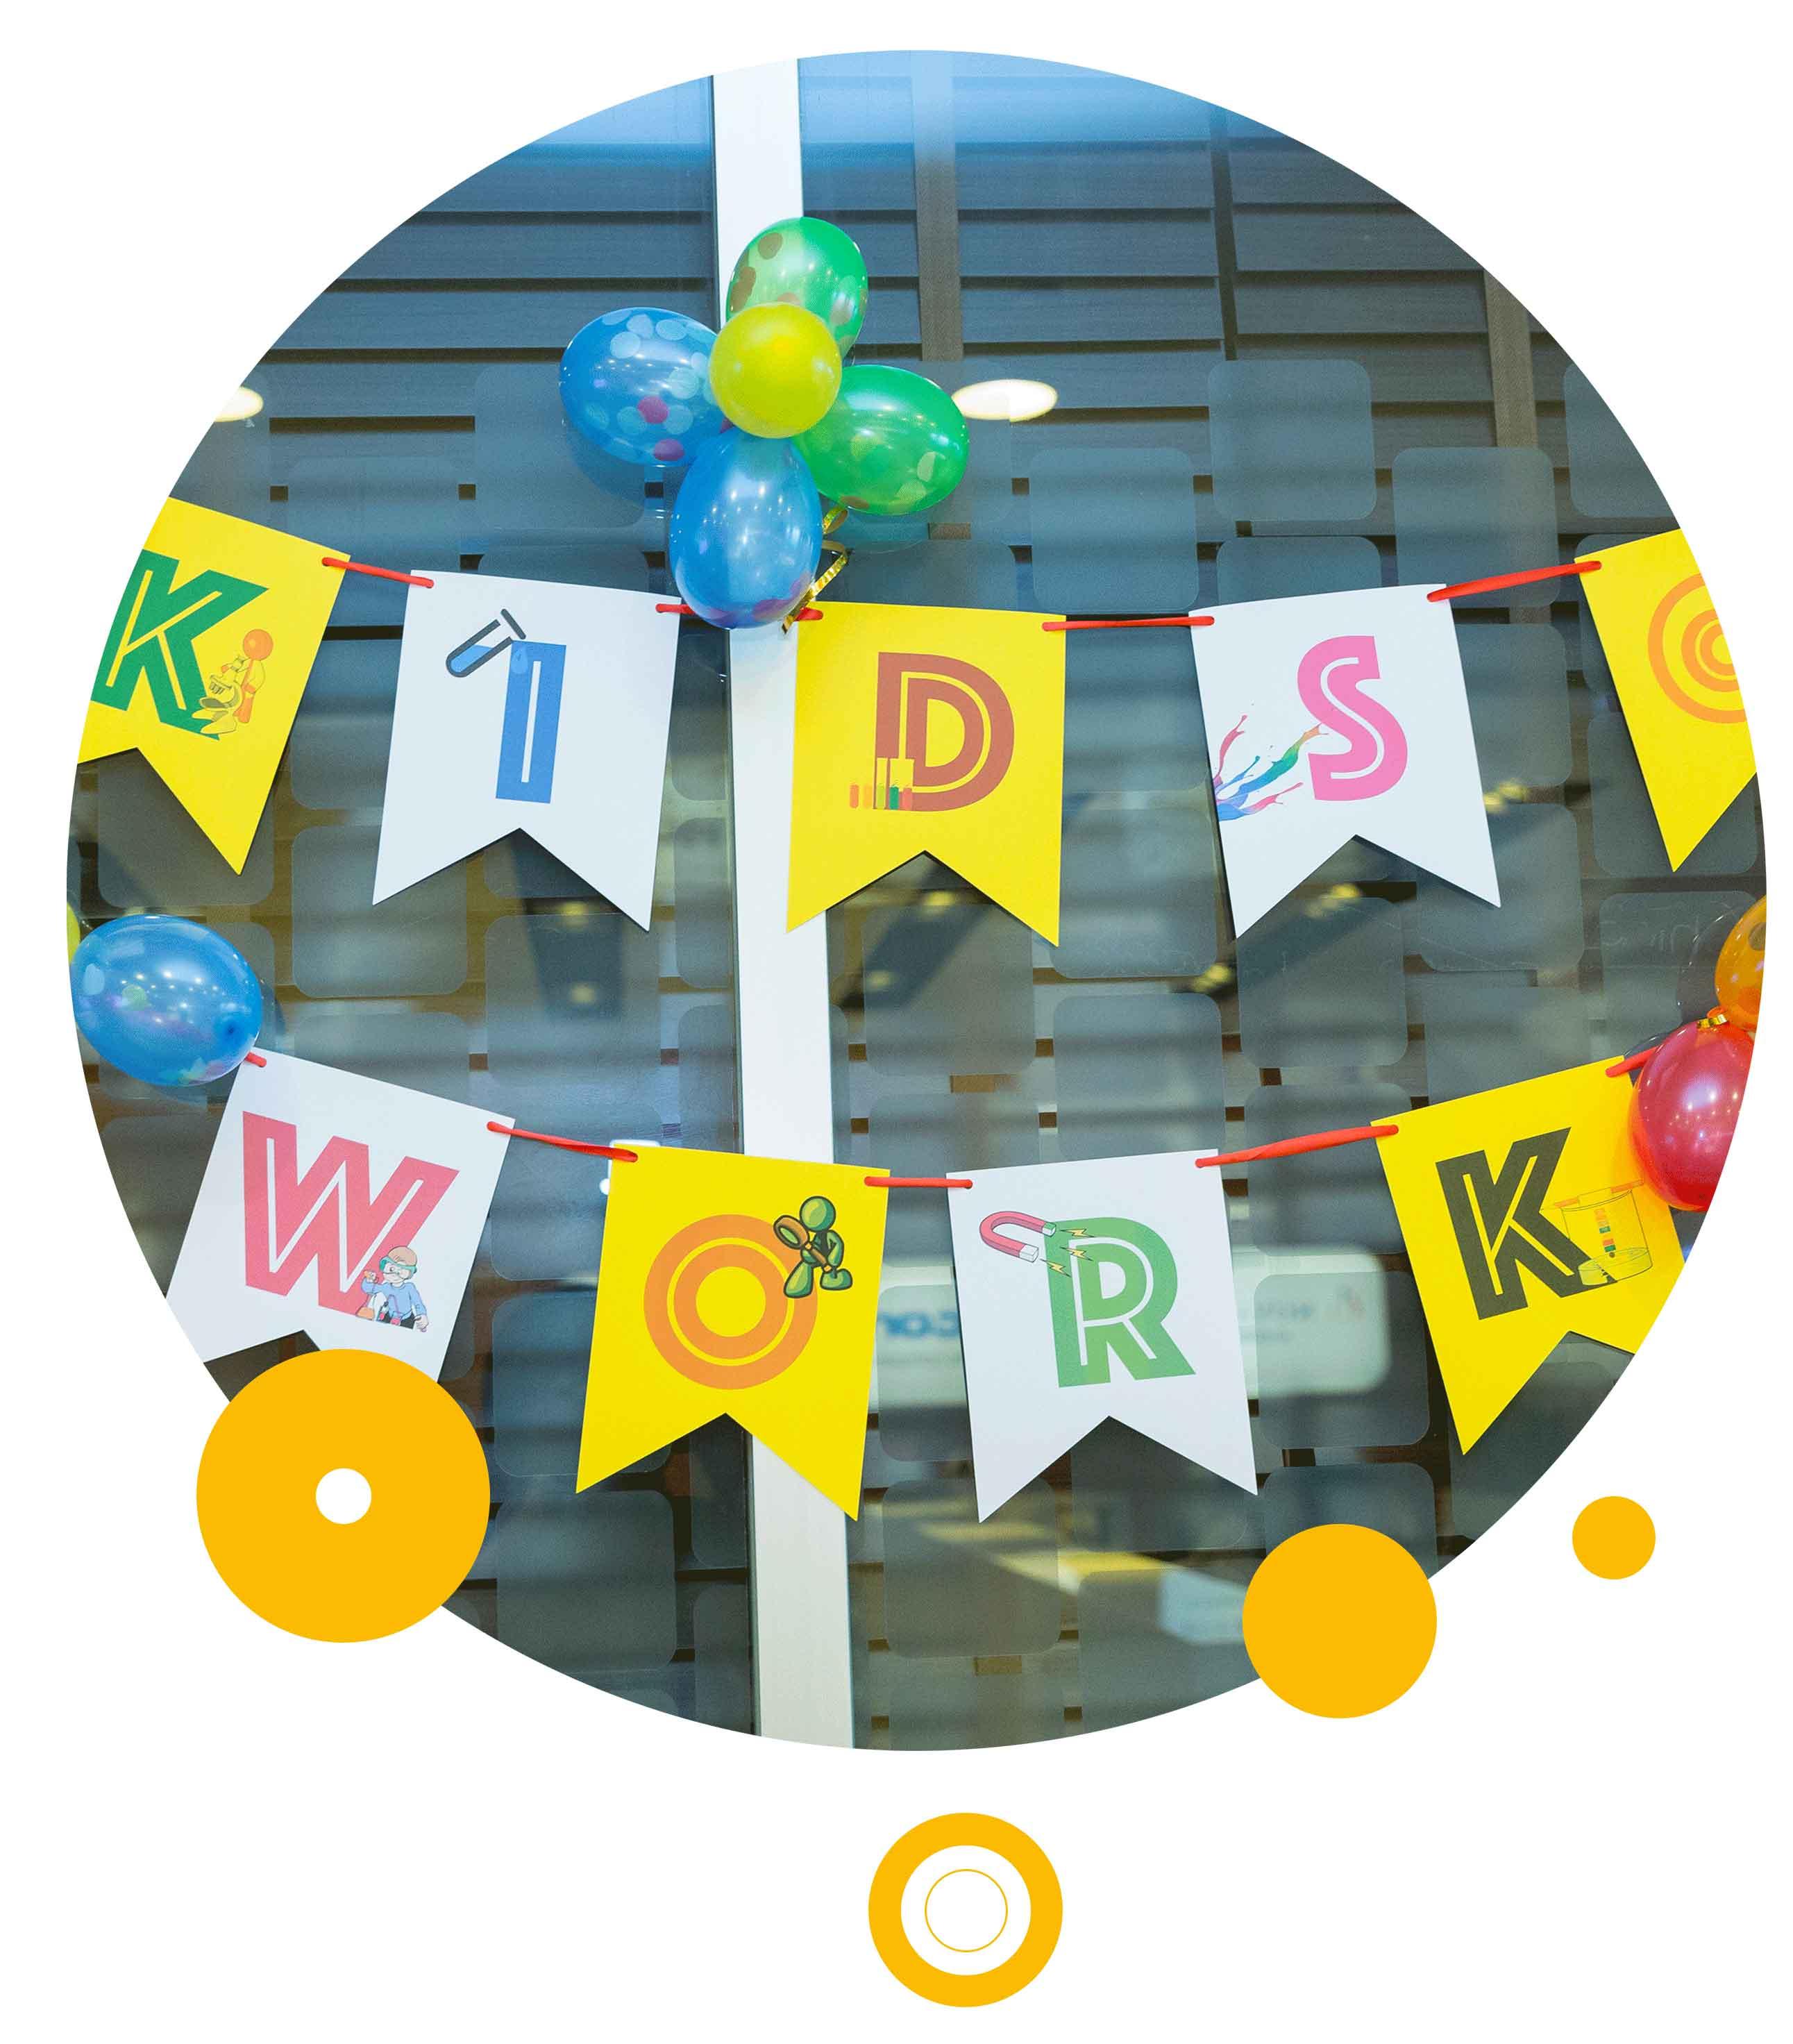 Bring kids to work